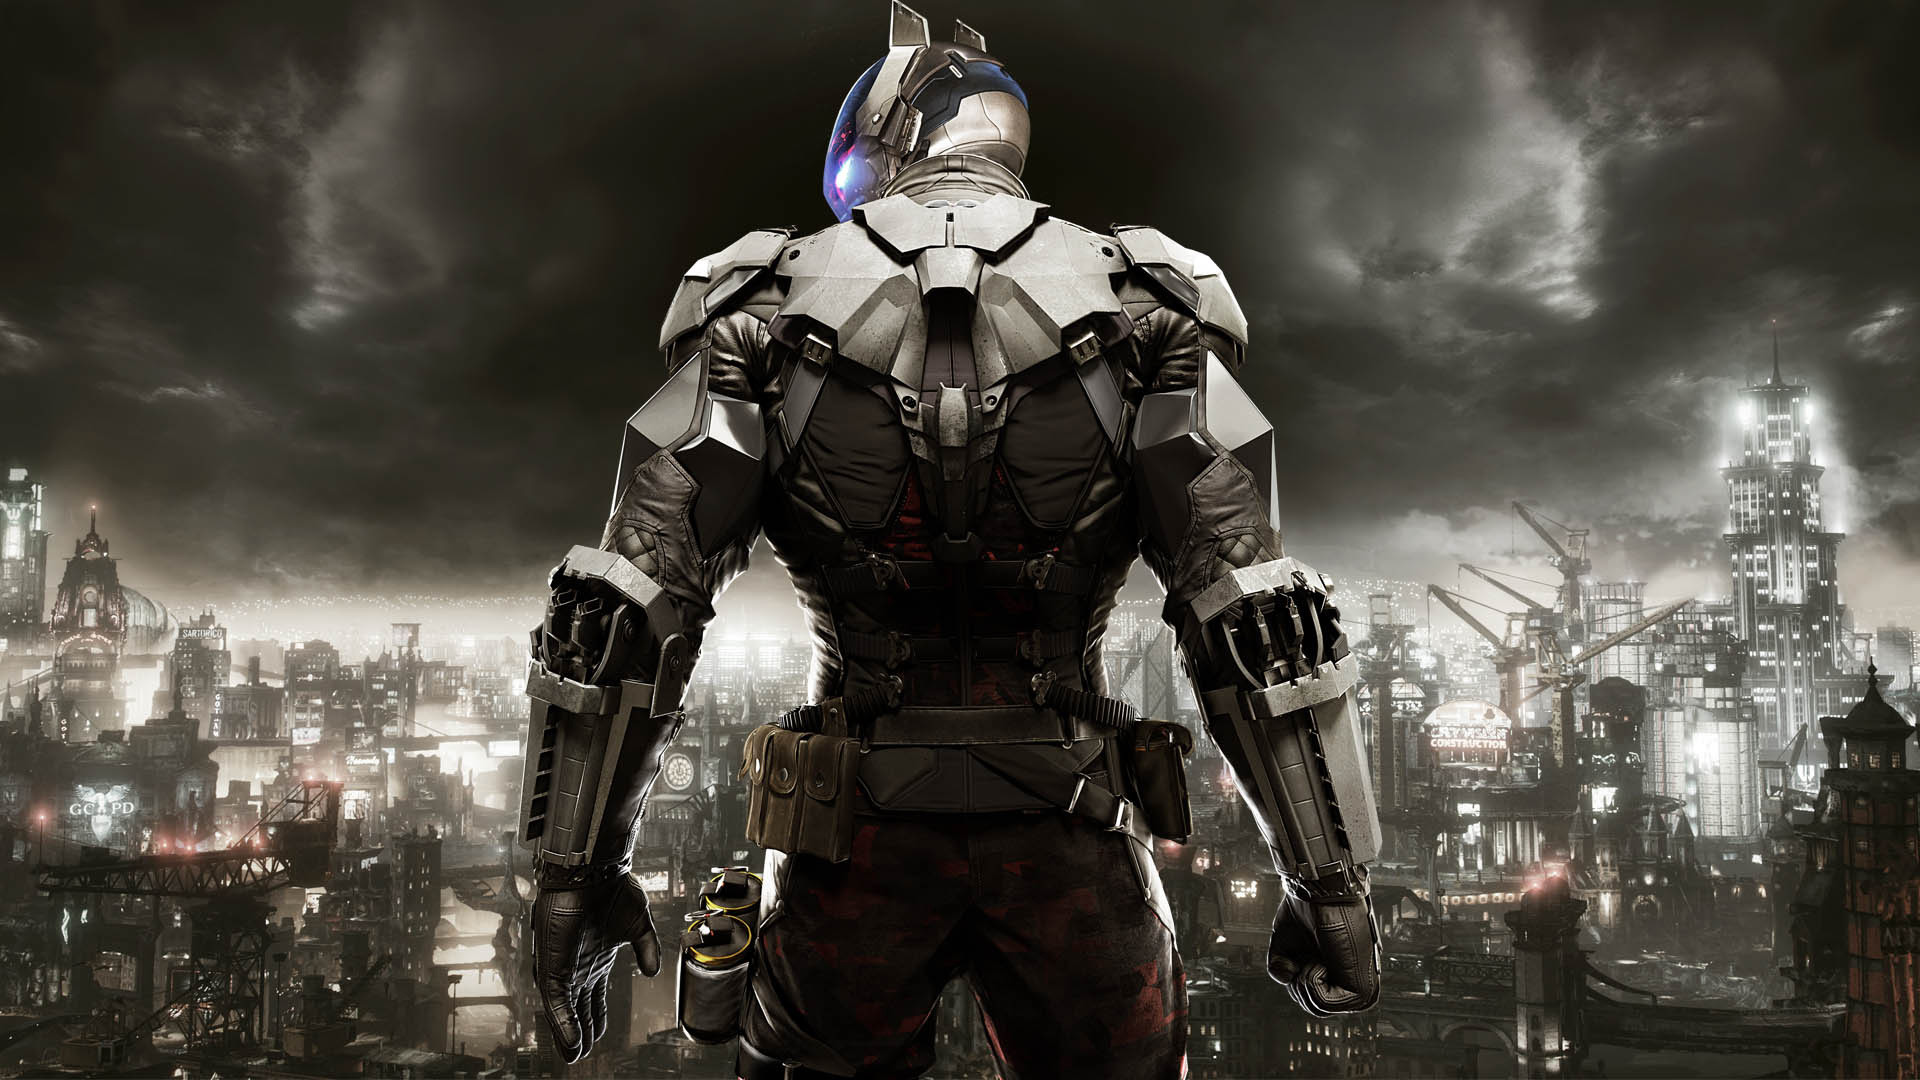 arkham knight – Google Search · Batman Arkham Knight  VillainsArmorsDarknessSoldiersKnightsWallpapersJason ToddRed HoodPunisher